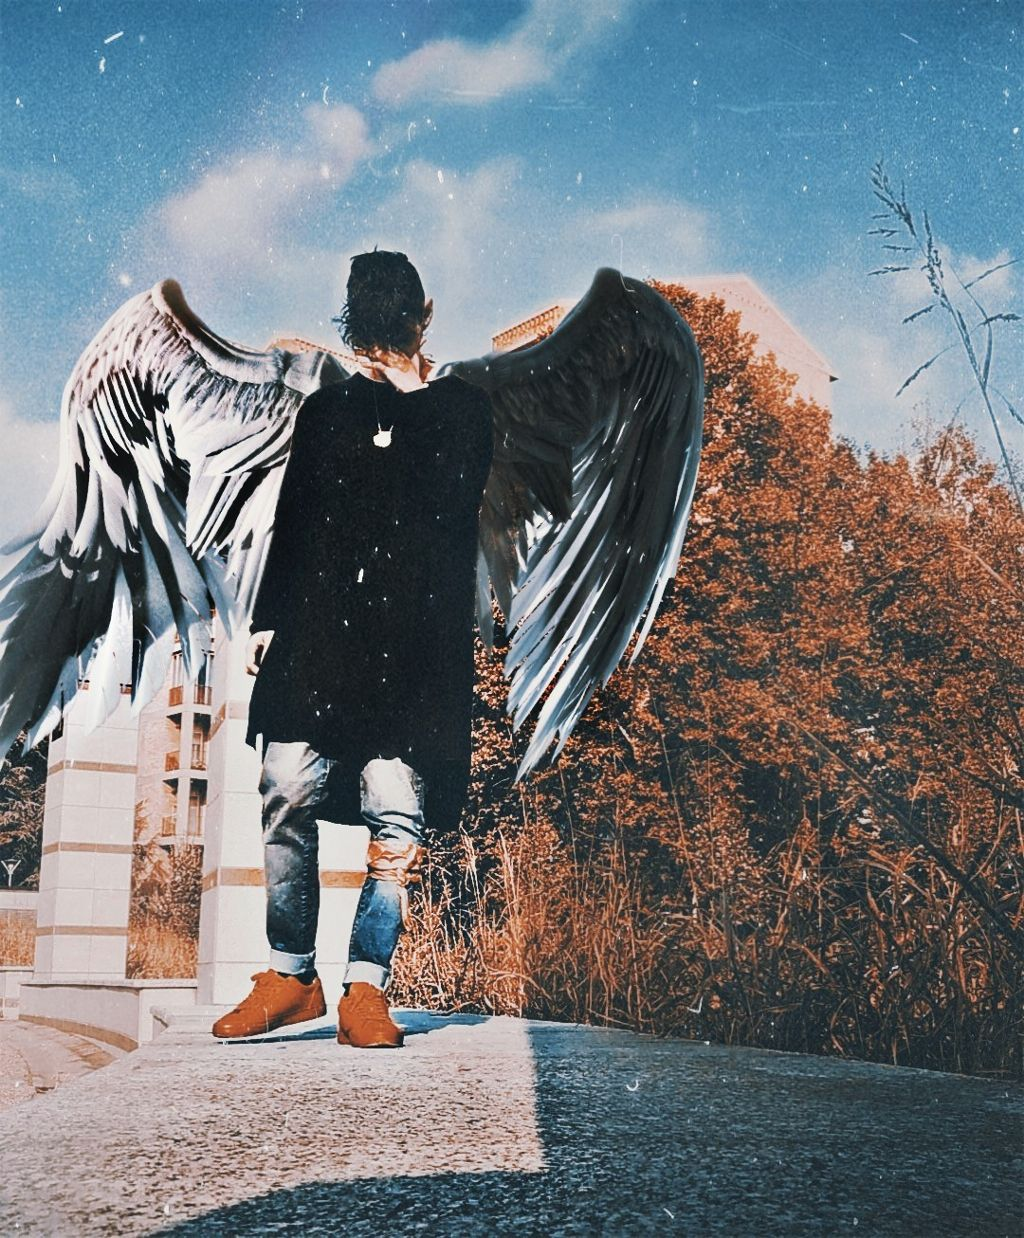 #freetoedit #wings #fly #tumblr #retro #old #photo #reflex #polaroid #sadness #realpeople @picsart #picsart #artwork #premiumedition